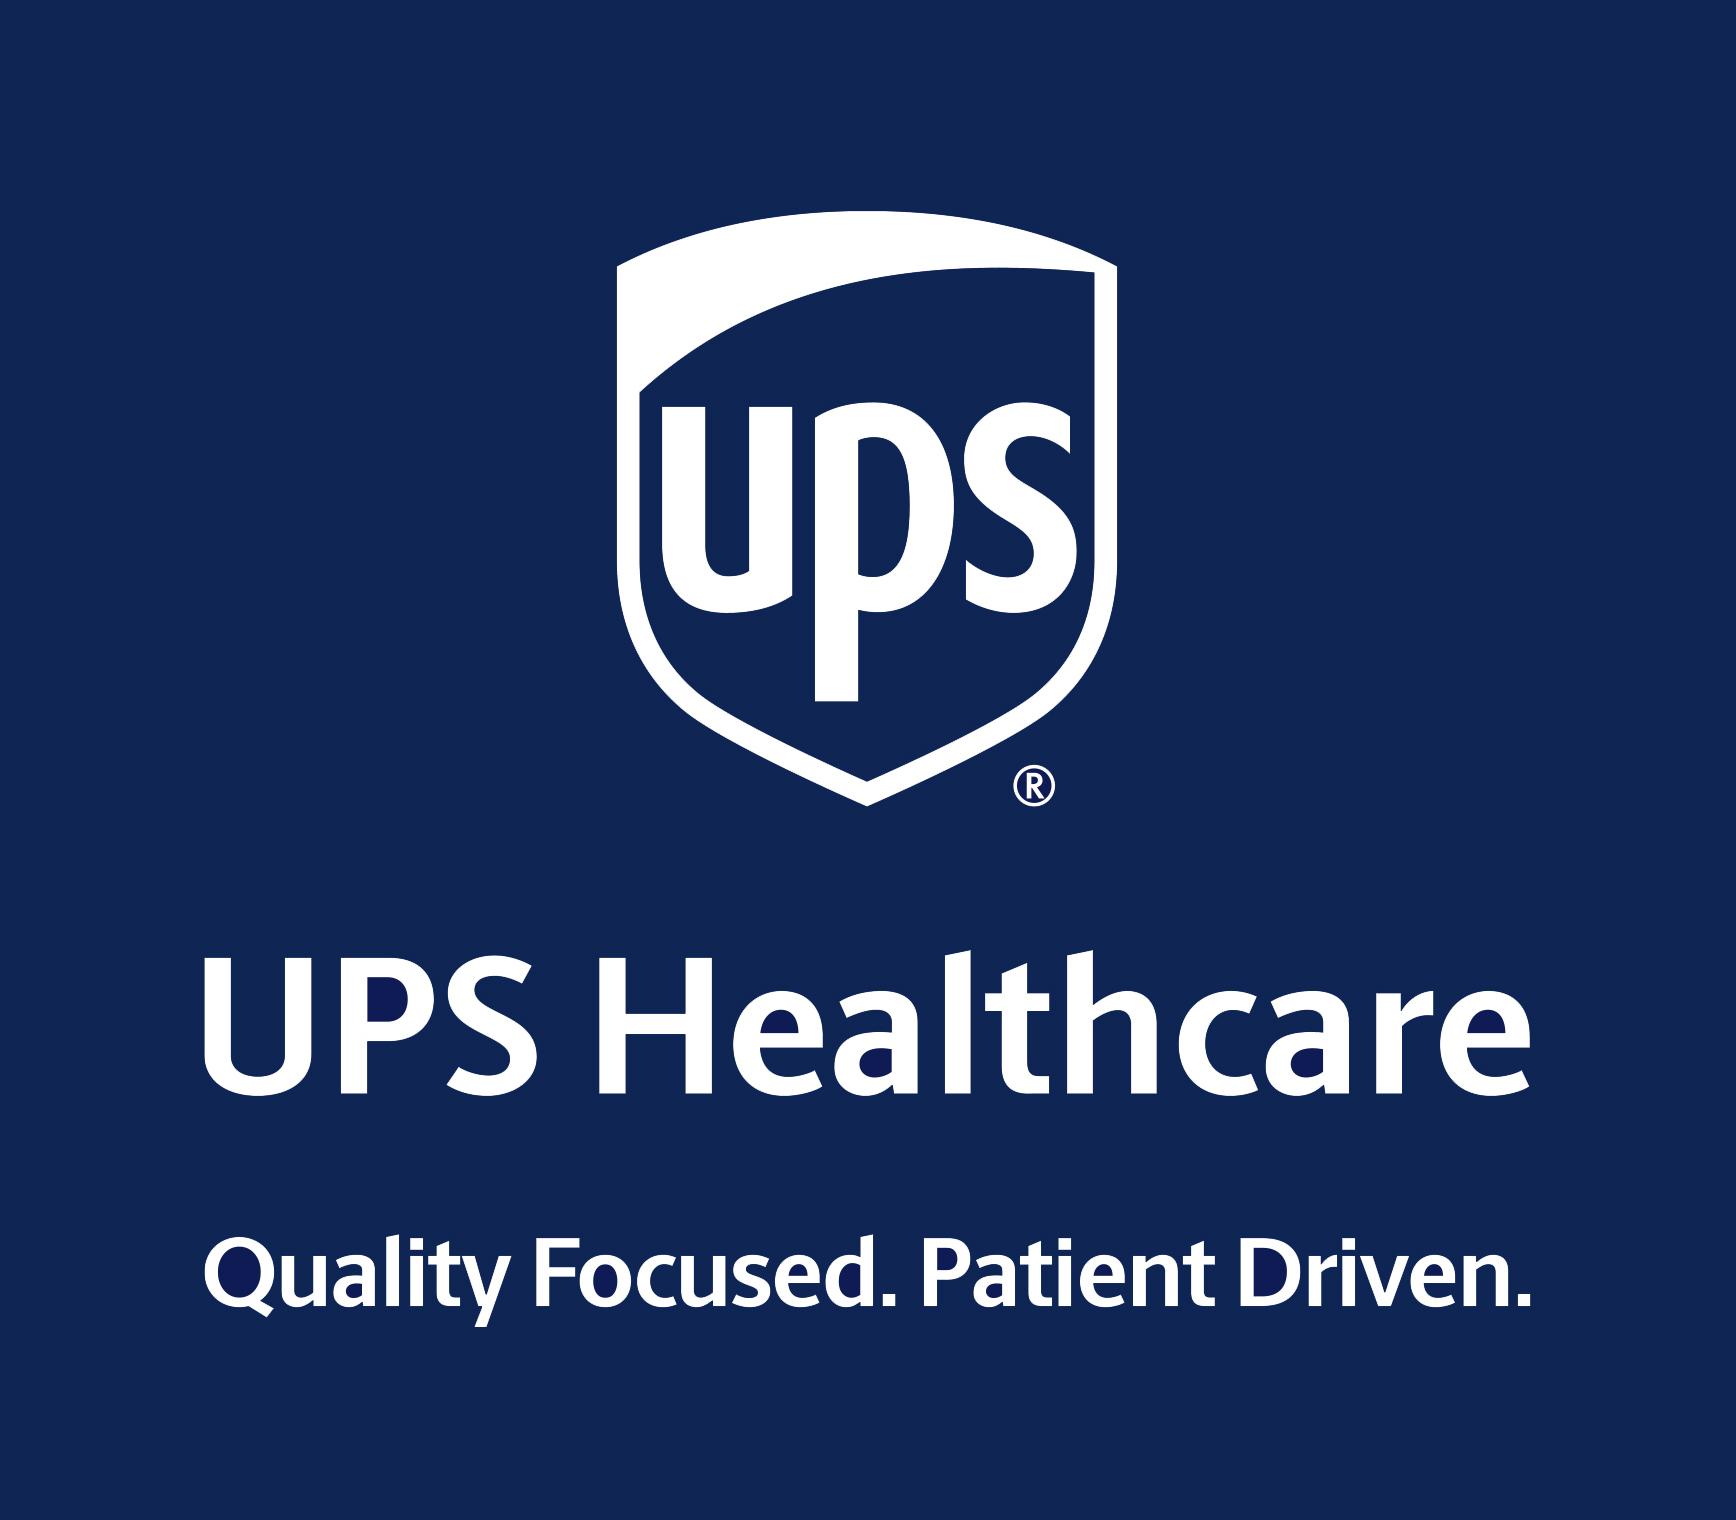 https://www.ups.com/us/en/services/healthcare.page